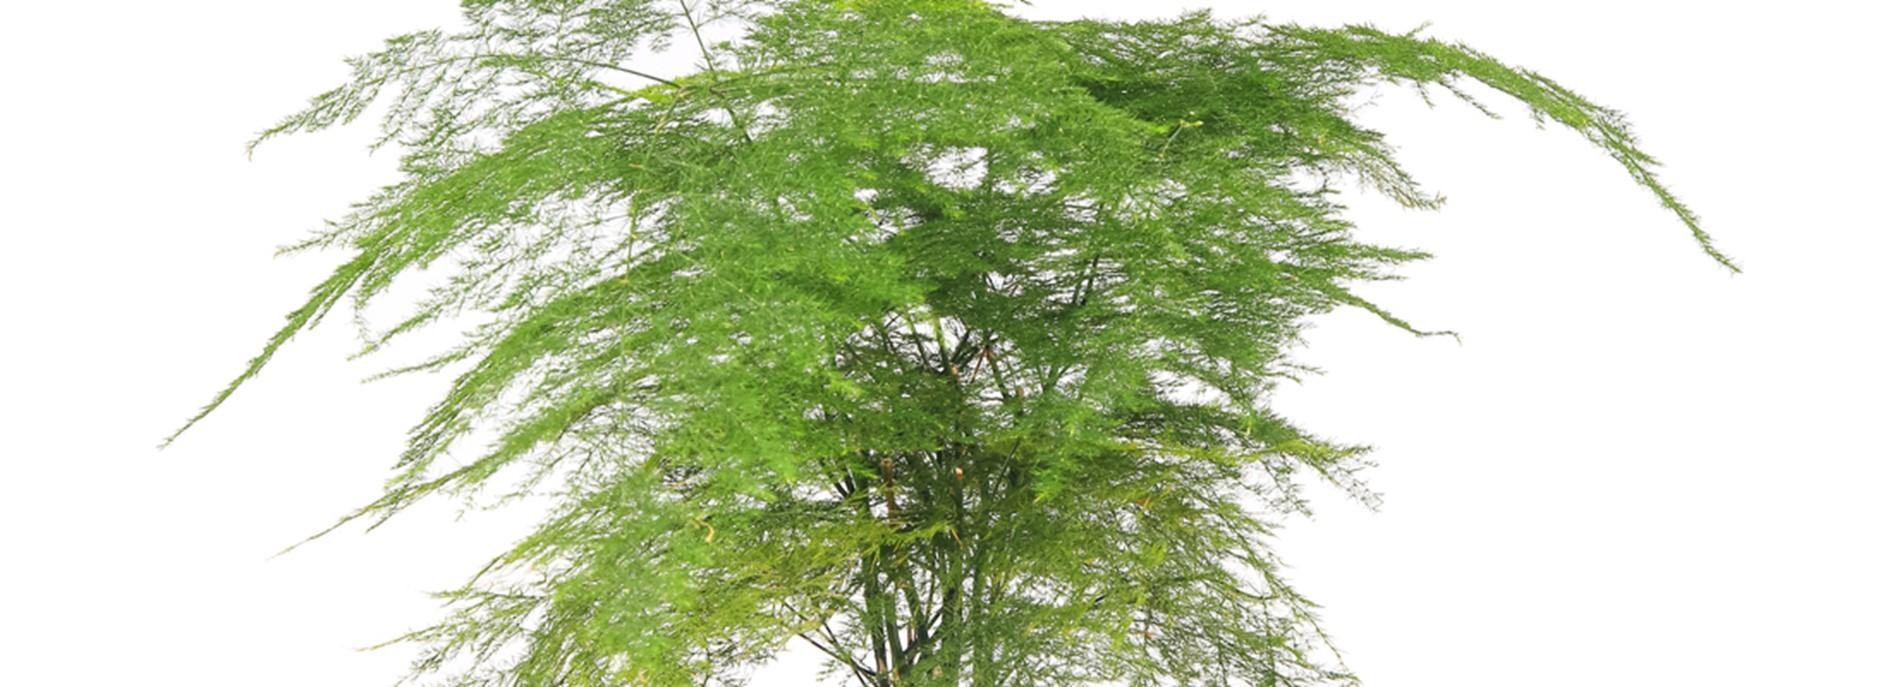 Evanthia blog asparagus